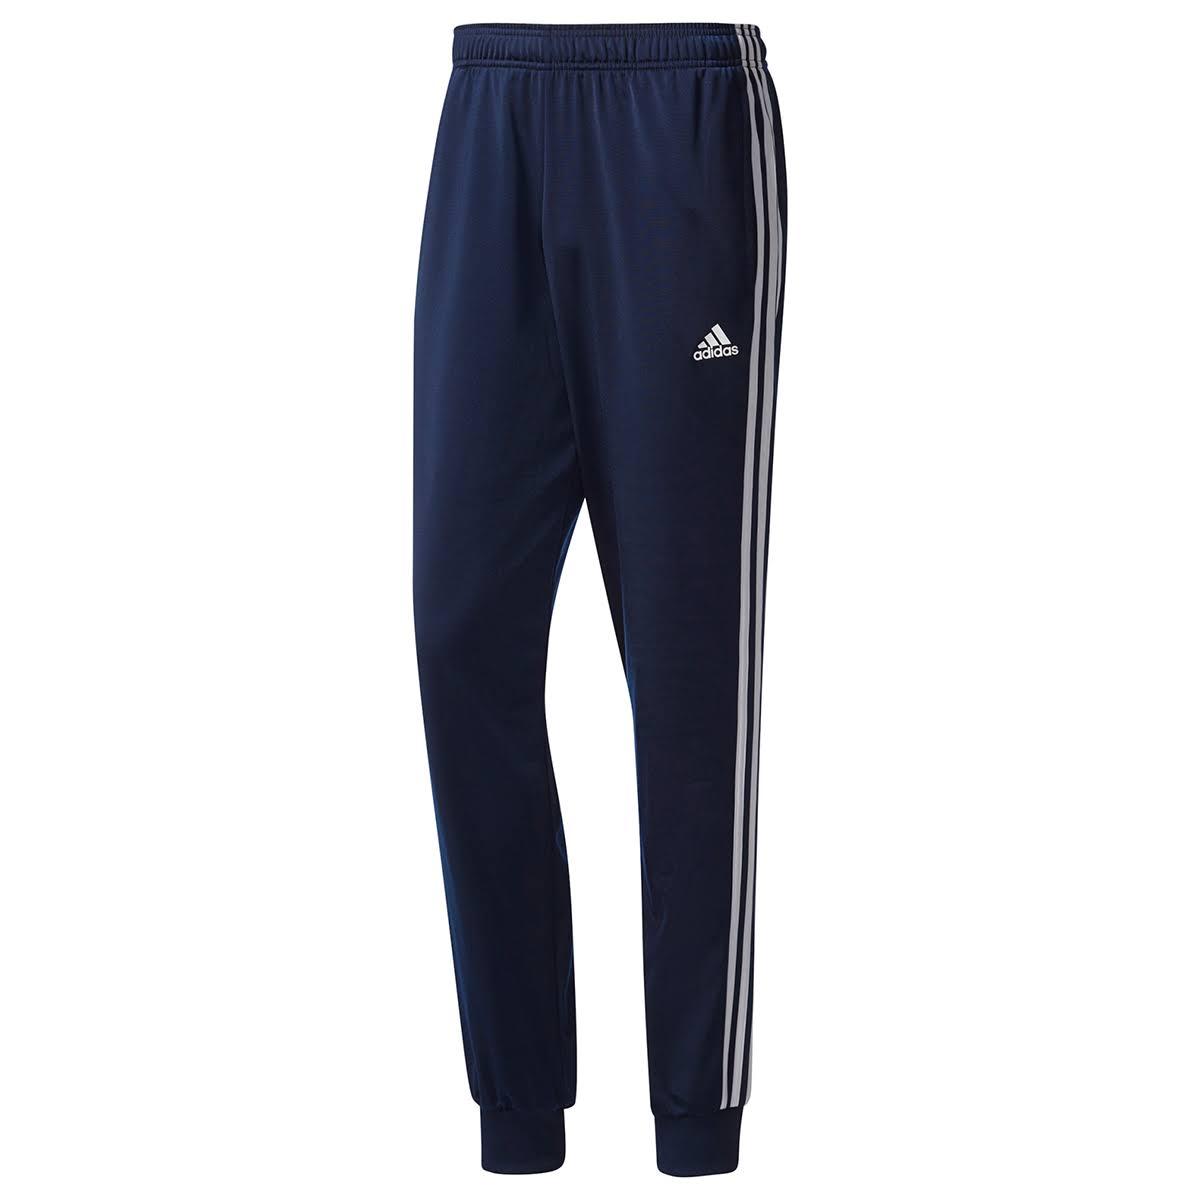 stripe essenziali Pantaloni tricot da Adidas uomo 3 affusolati m8wN0n